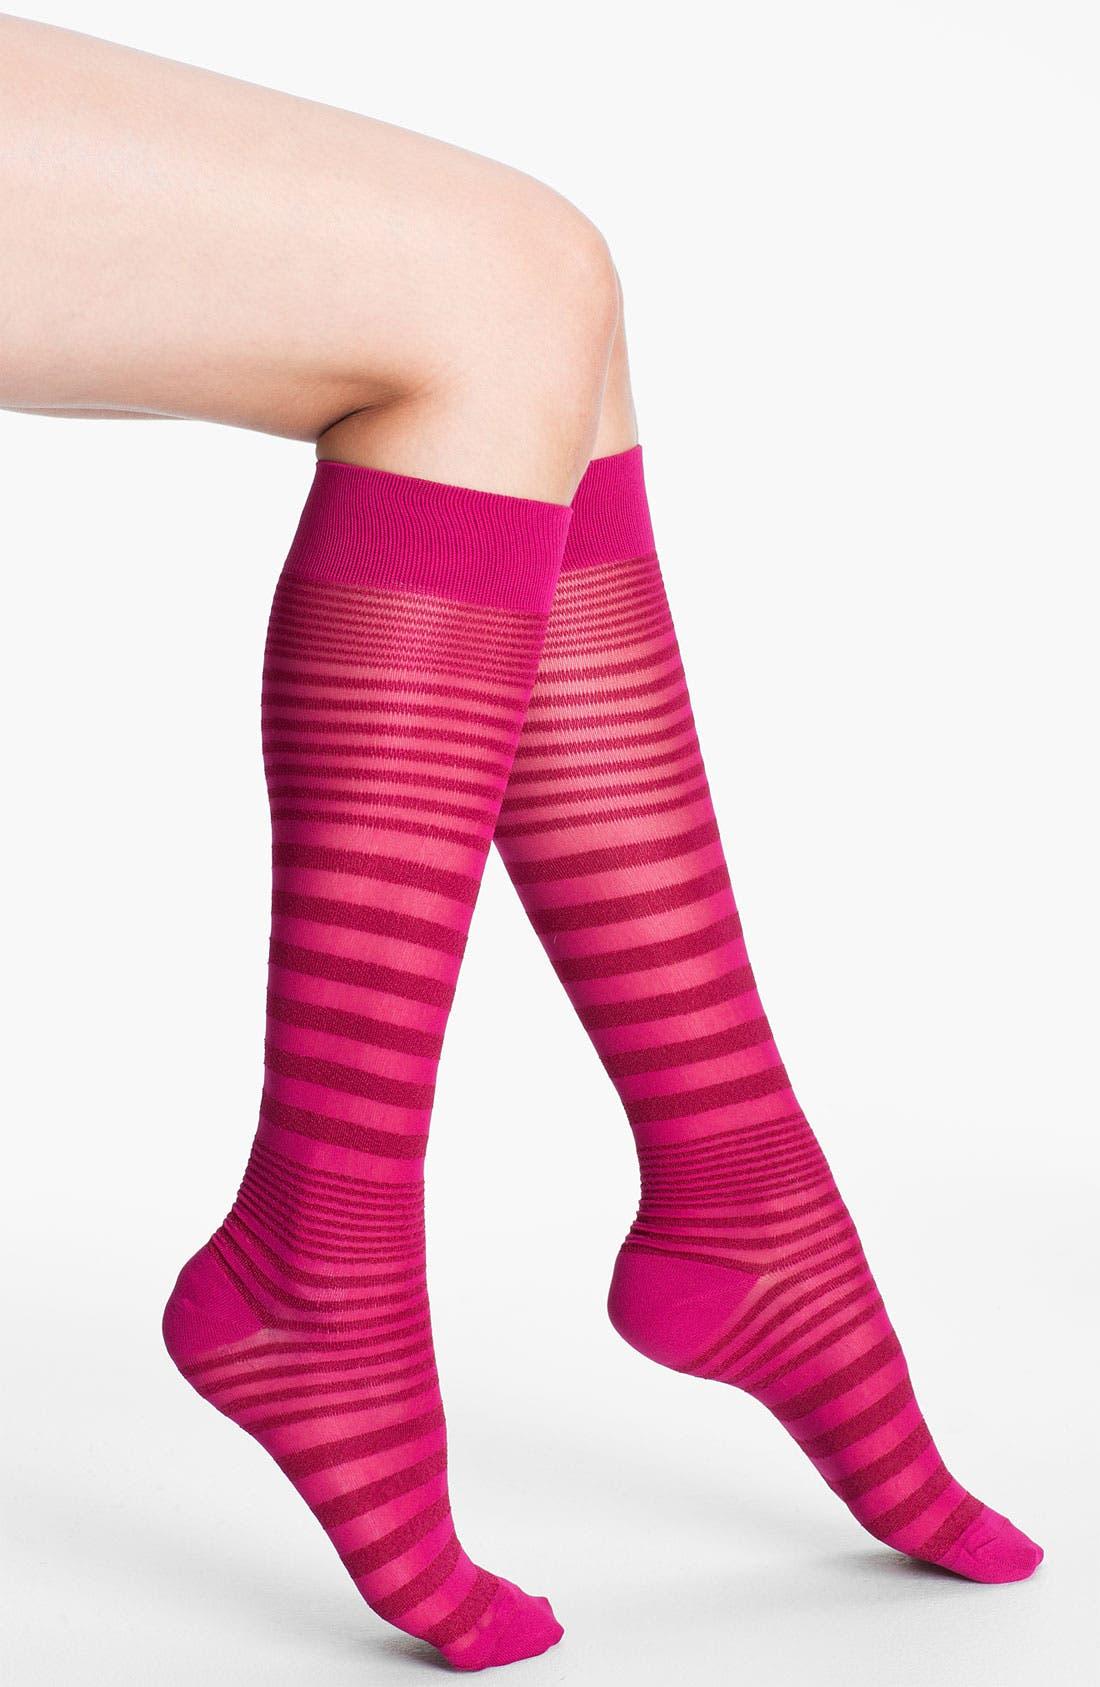 Alternate Image 1 Selected - Nordstrom Sheer Stripe Knee Highs